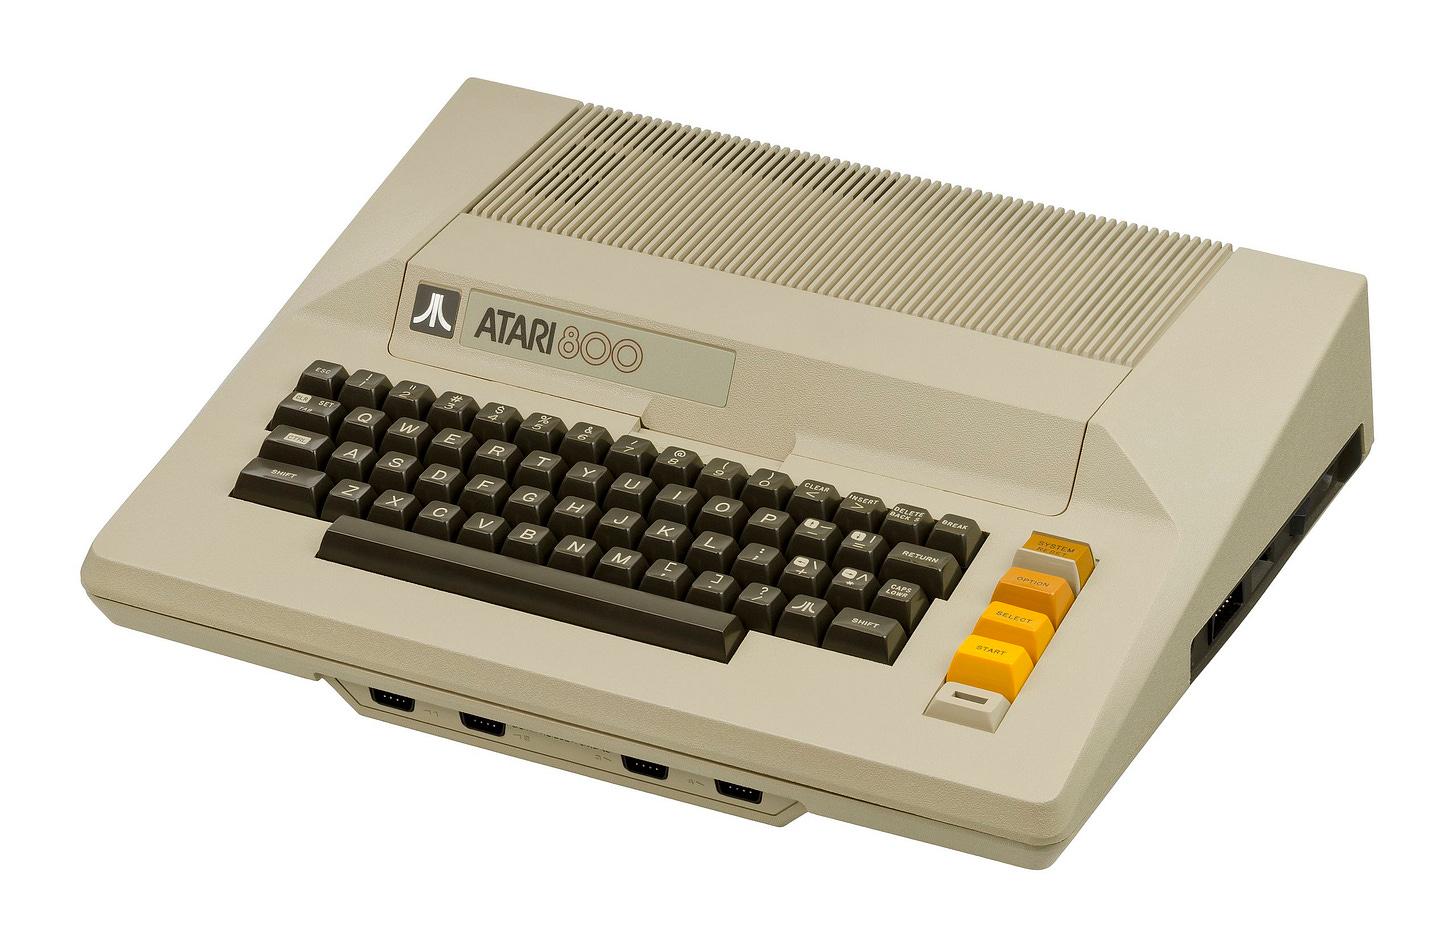 Photo of an Atari 800 computer.